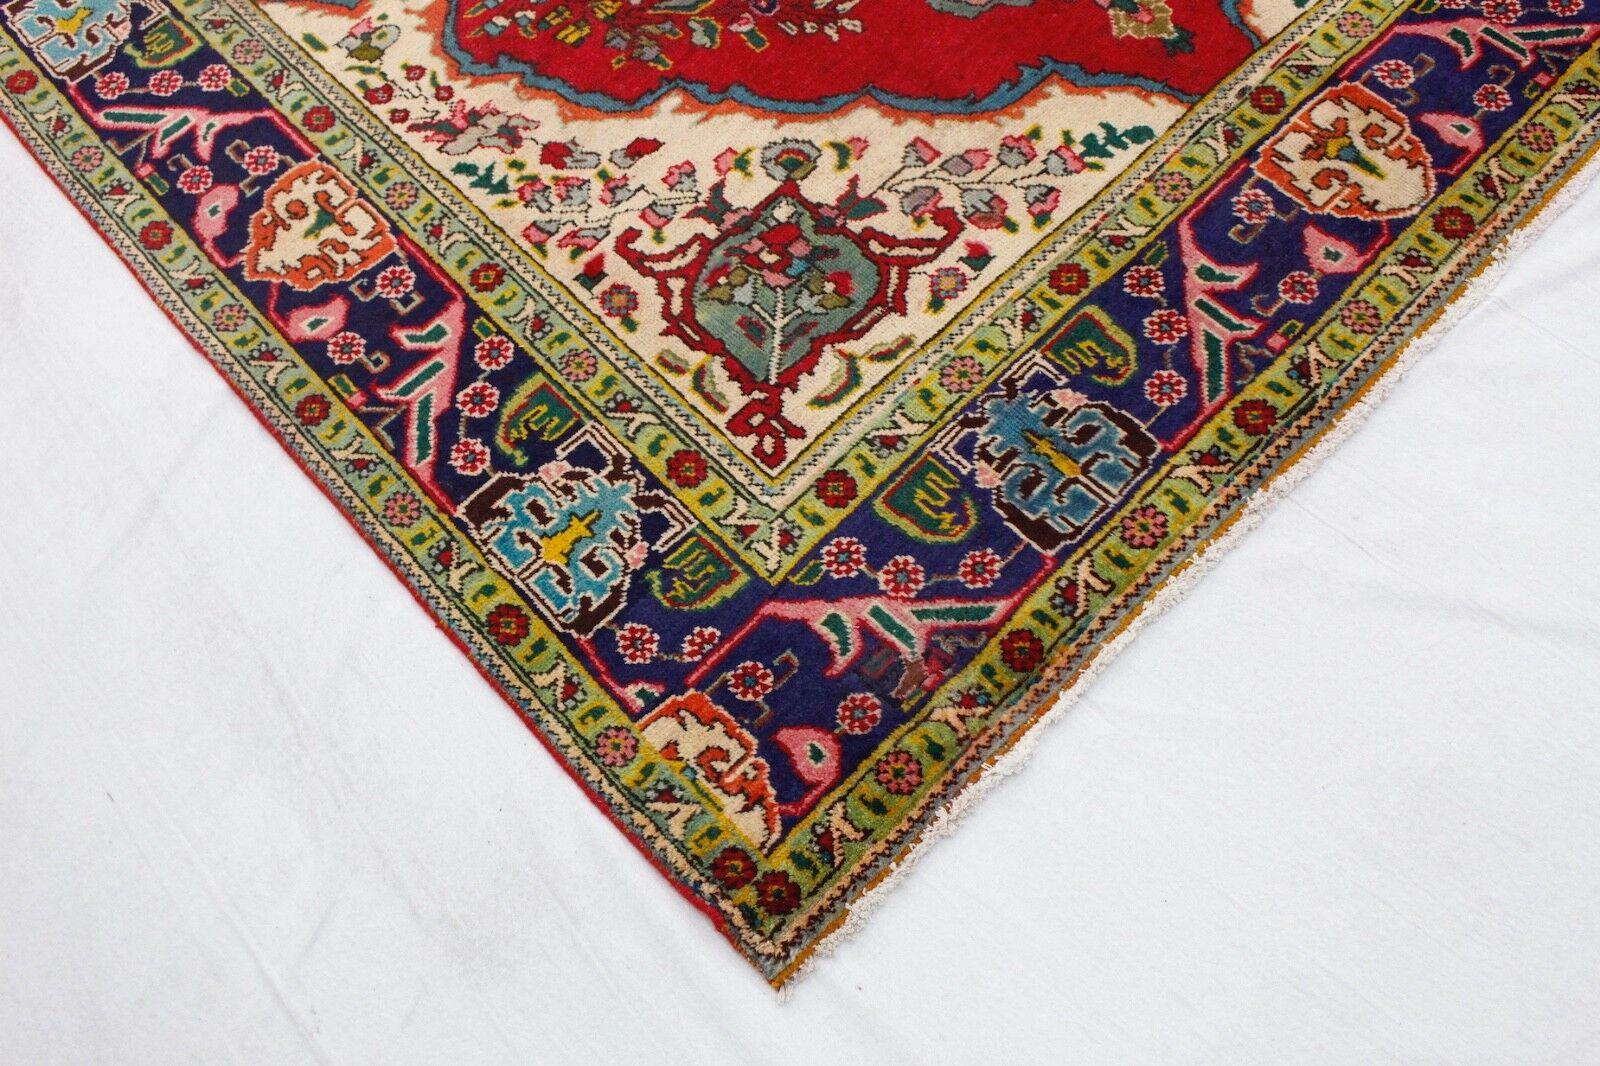 Magazzino Magazzino Magazzino vendita Tapis persan TÄBRIZ VINTAGE 310x200 mano intessuti pulito KL 3905 b2e52f